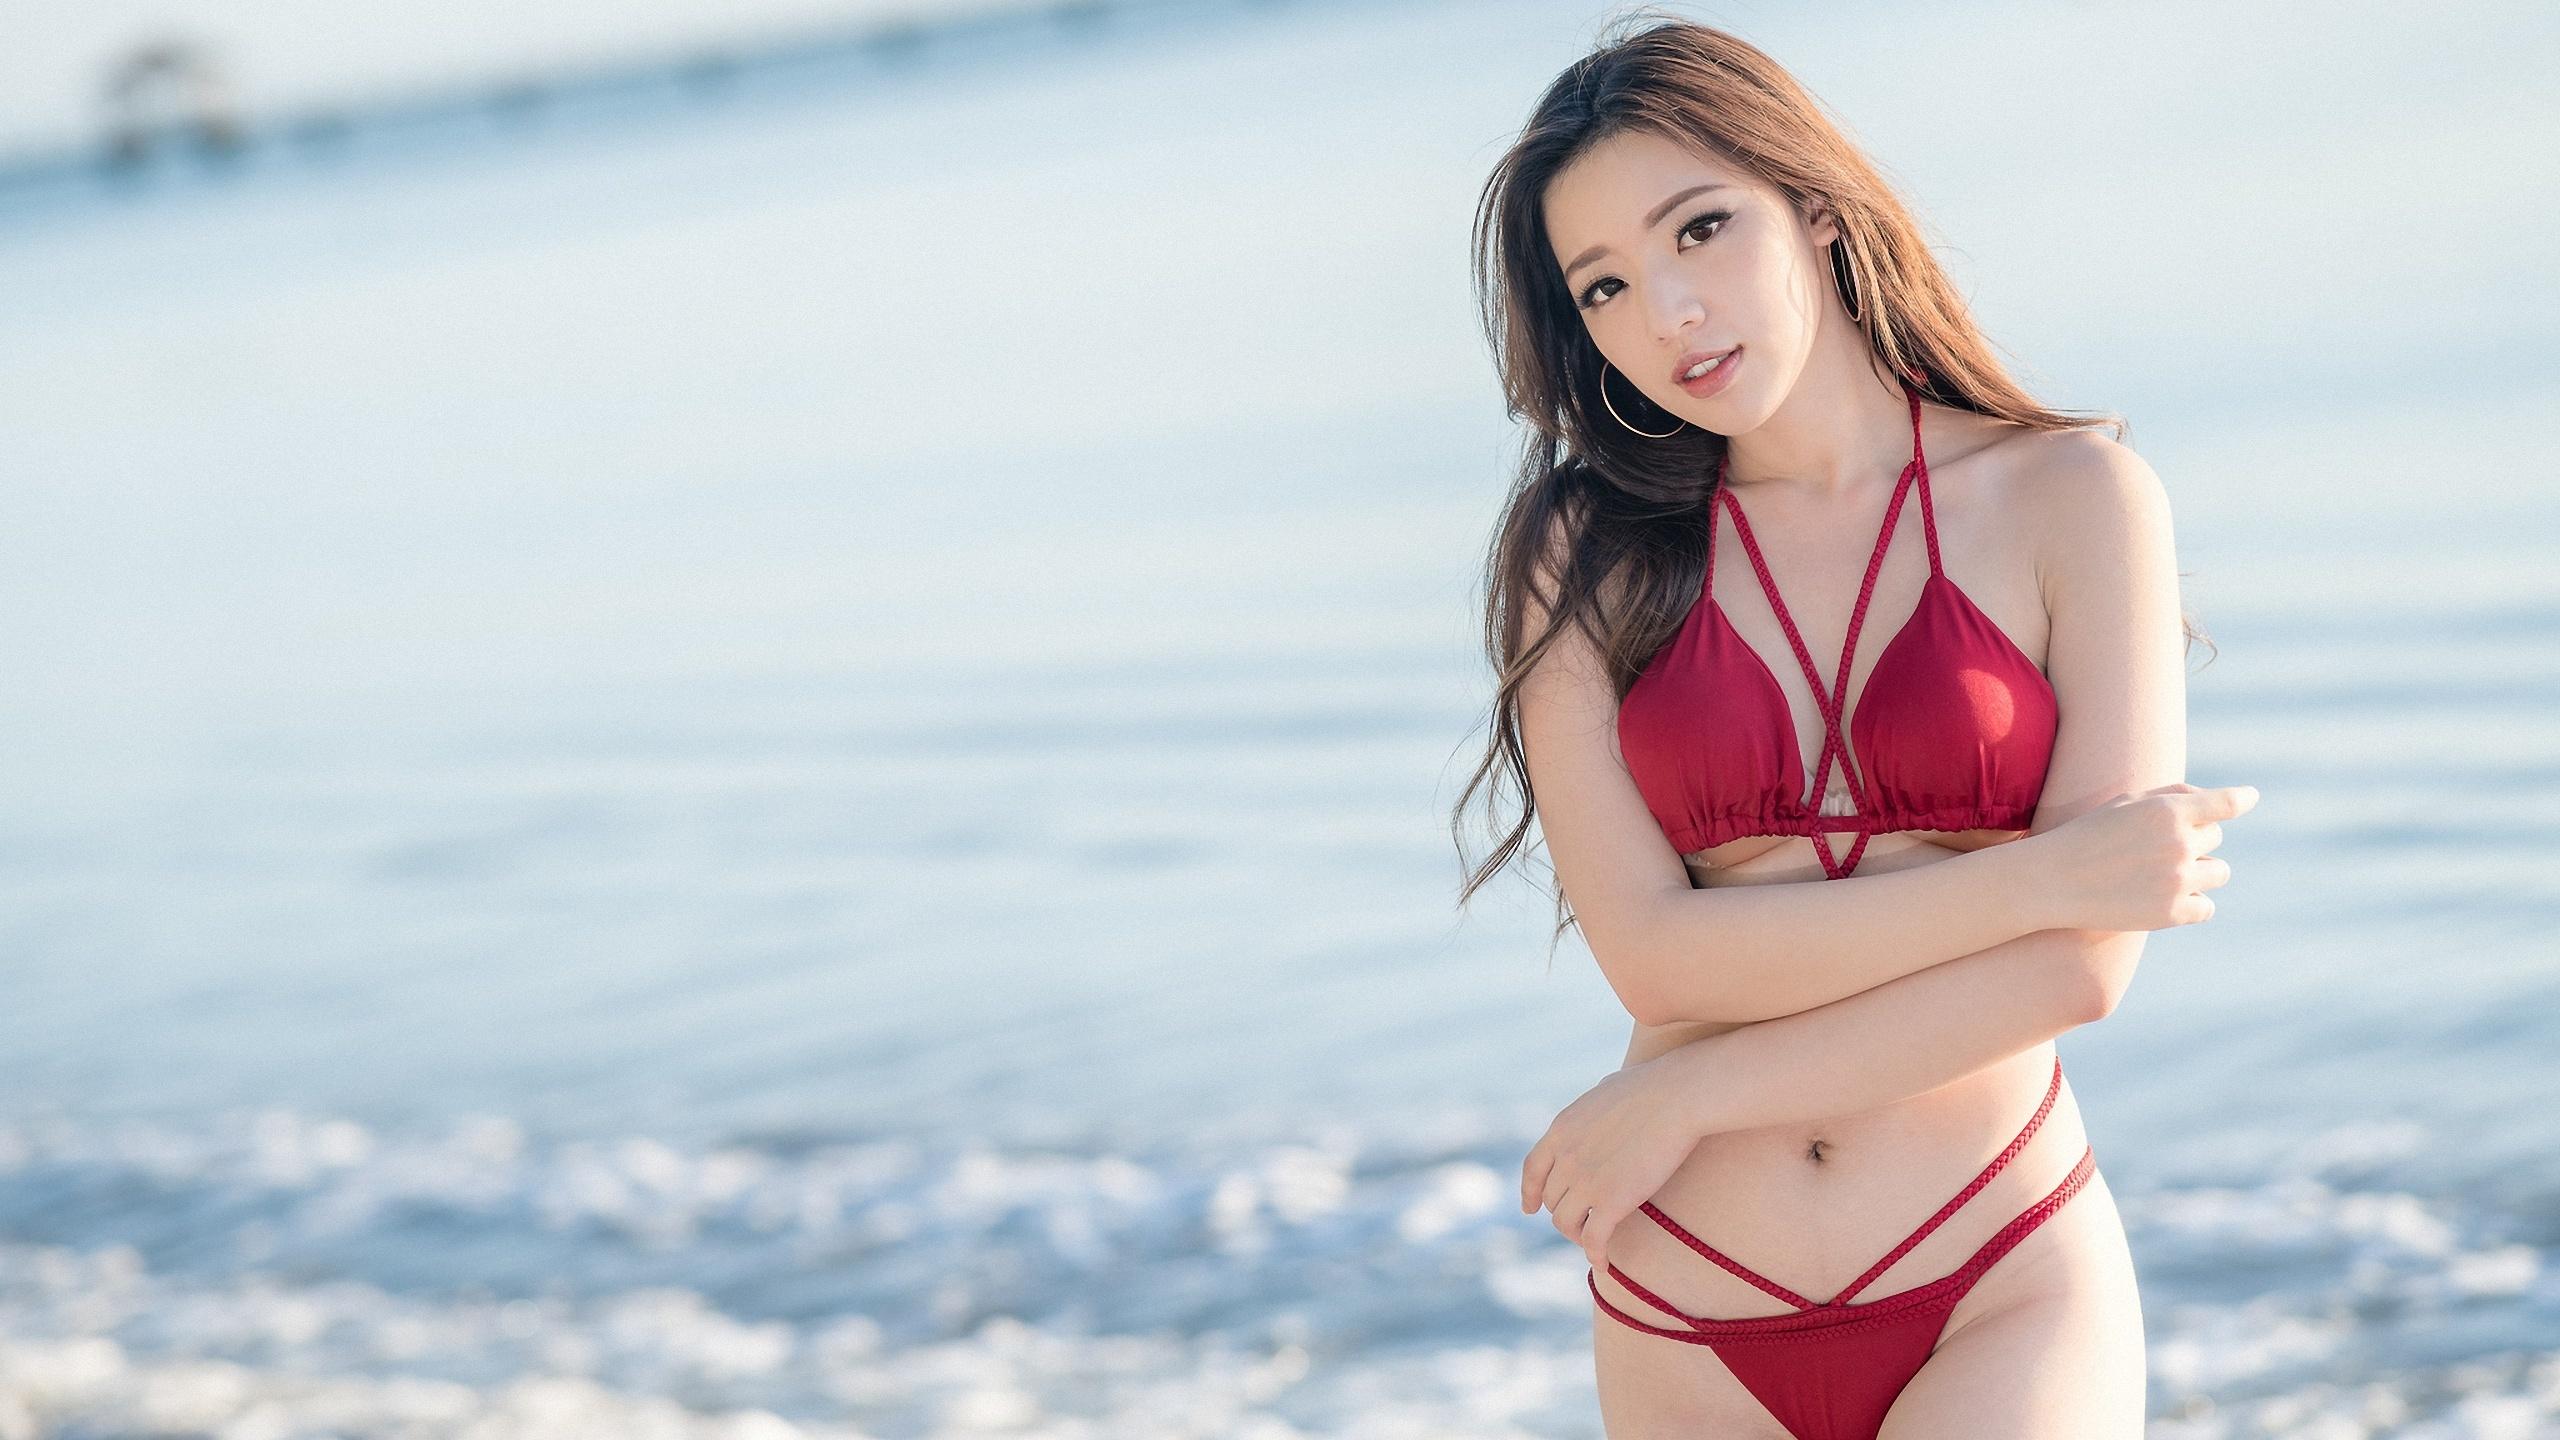 Asian Porn Fapdu sexy asian bikini dance | forthofer.eu